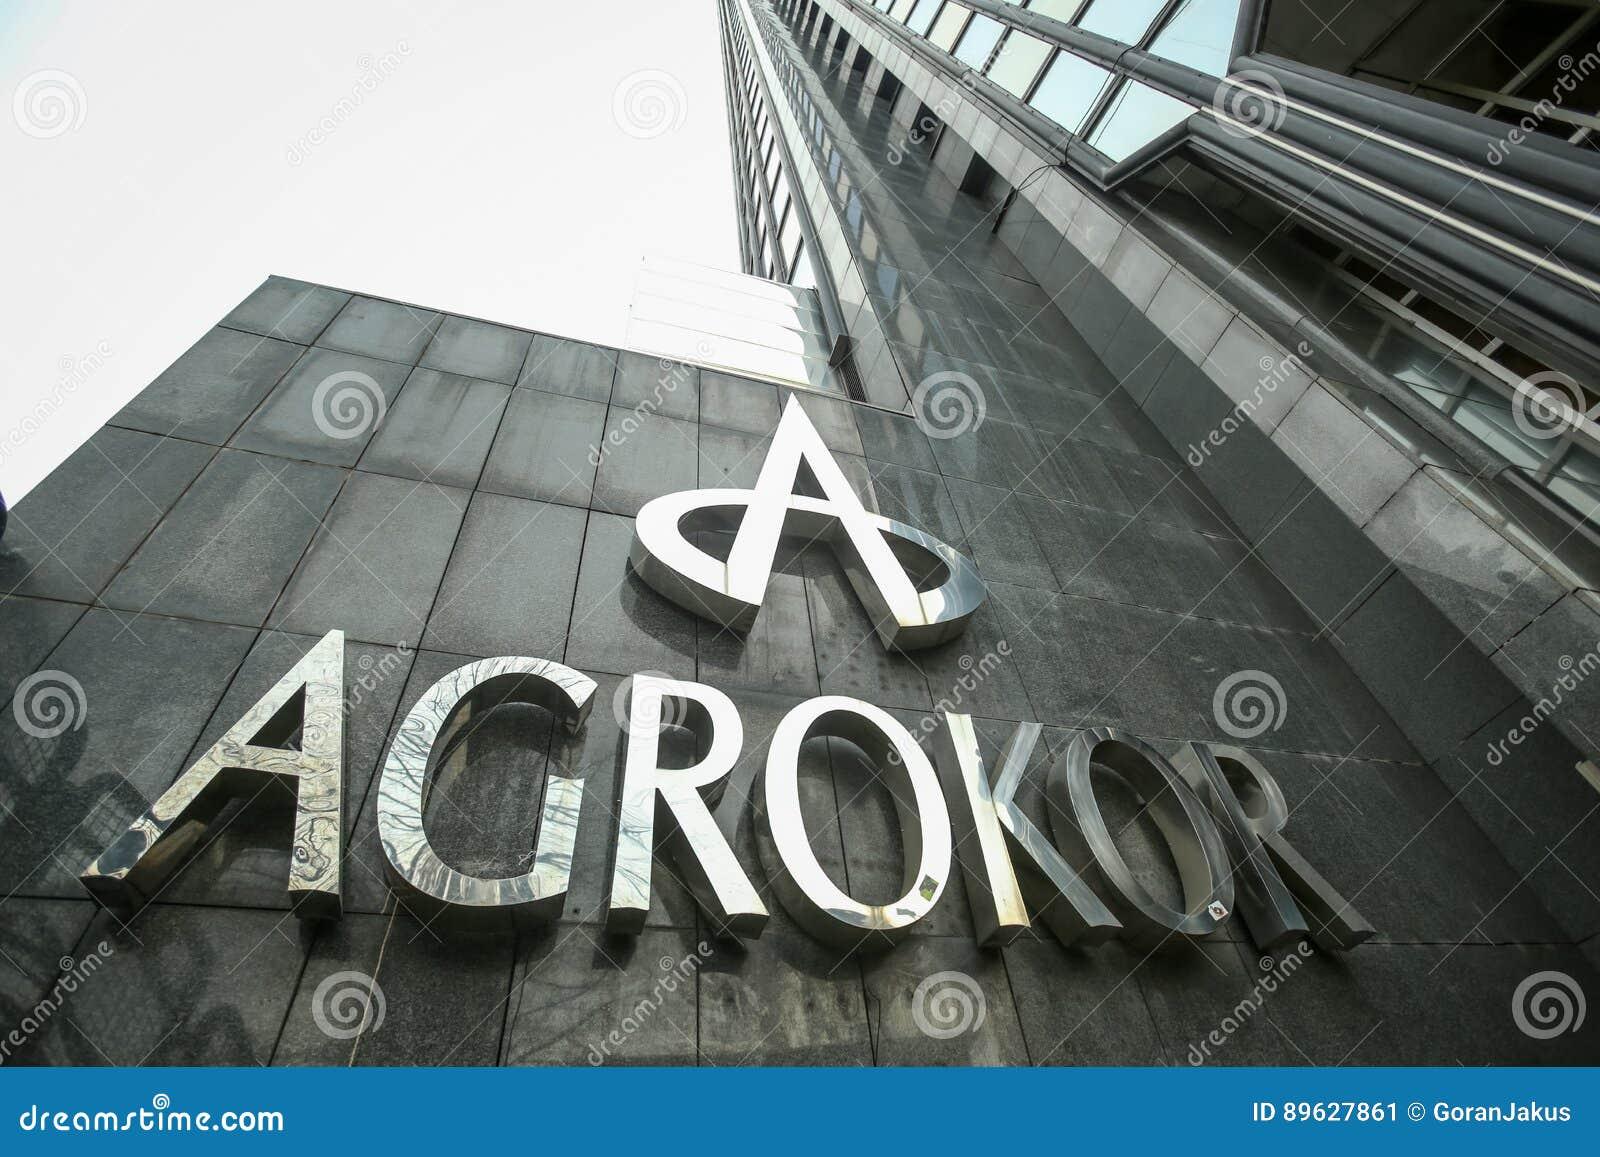 agrokor logo editorial photo image of horizontal